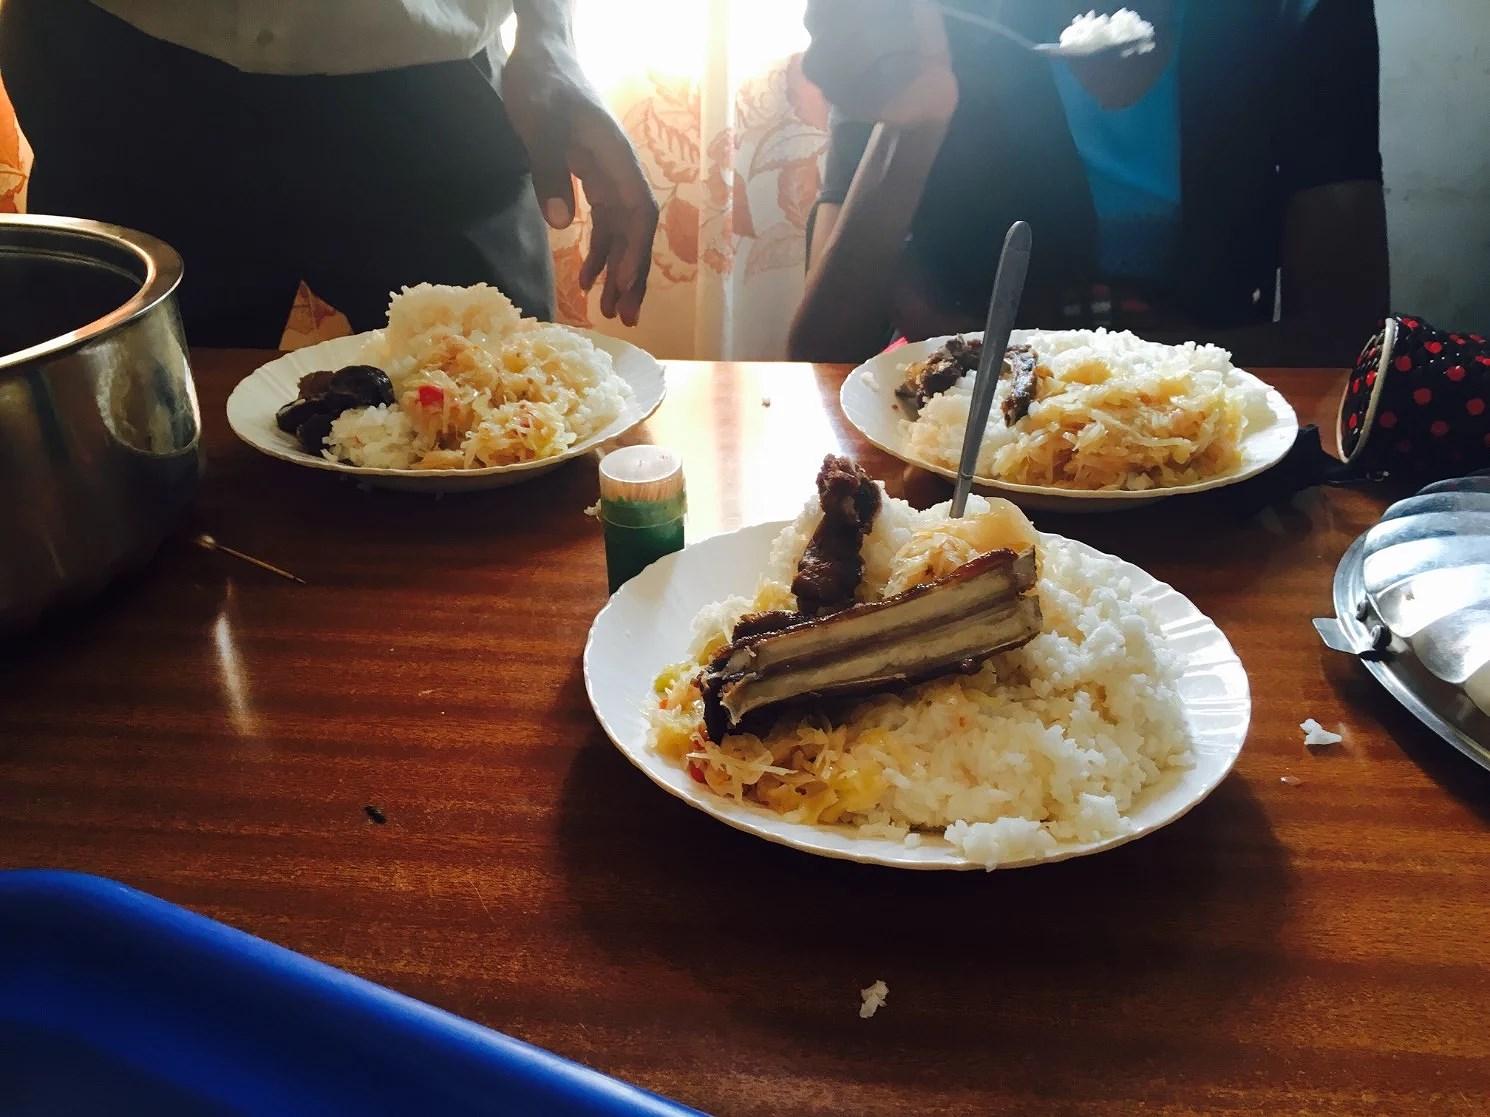 Den afrikanska maten...